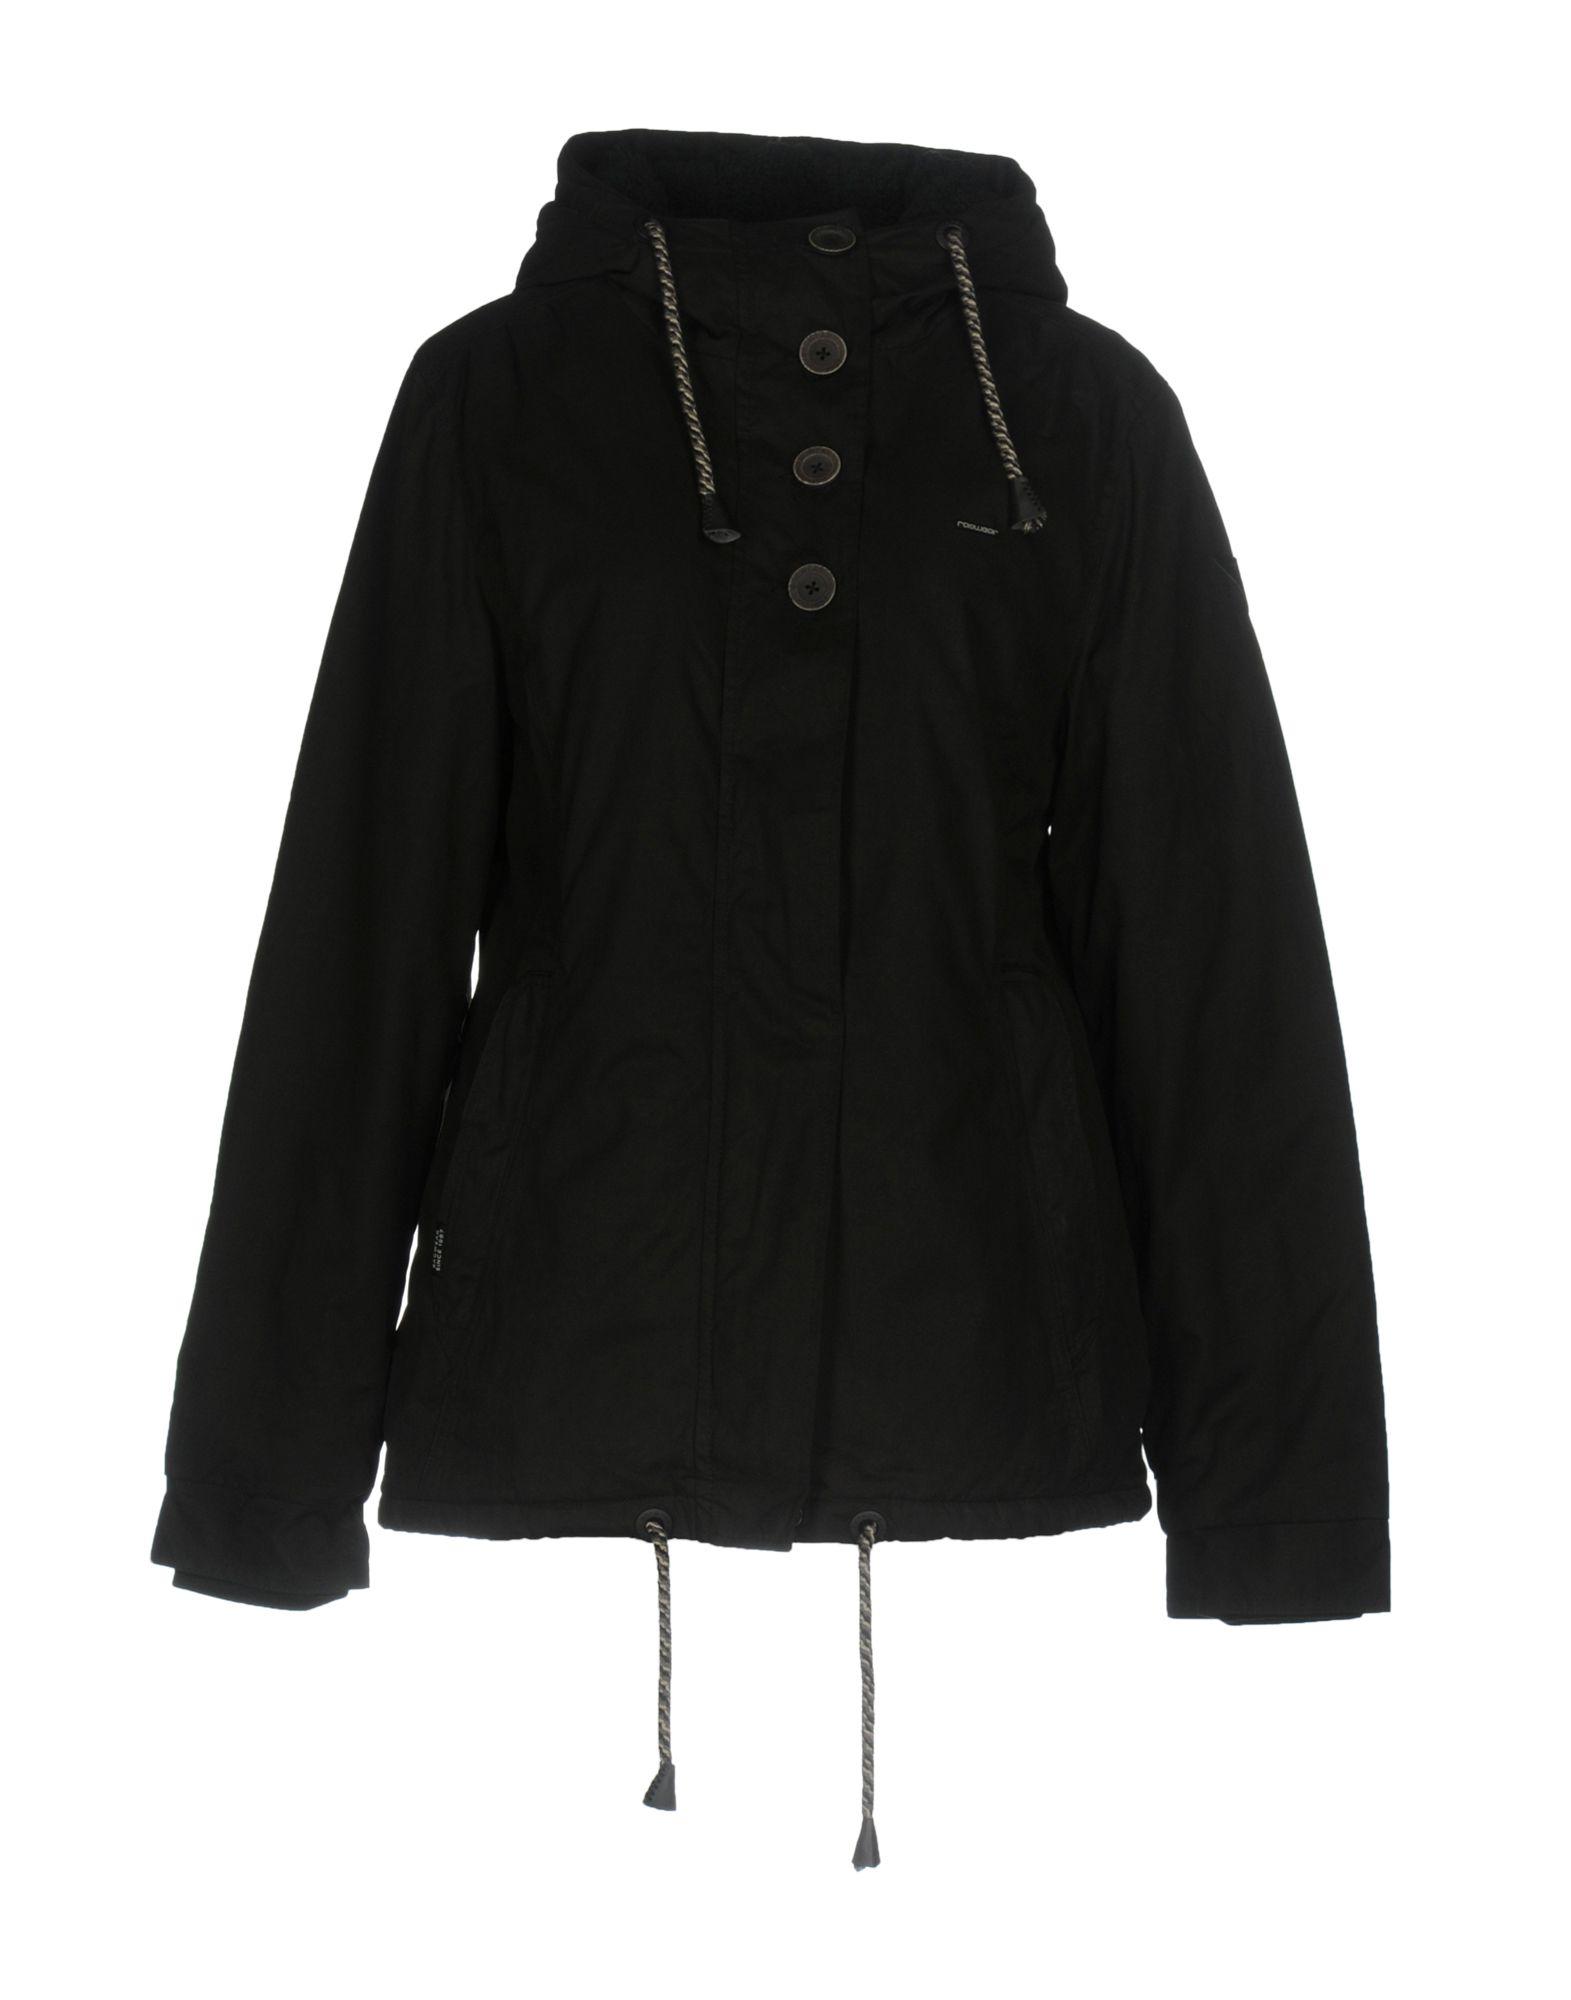 RAGWEAR Damen Jacke Farbe Schwarz Größe 7